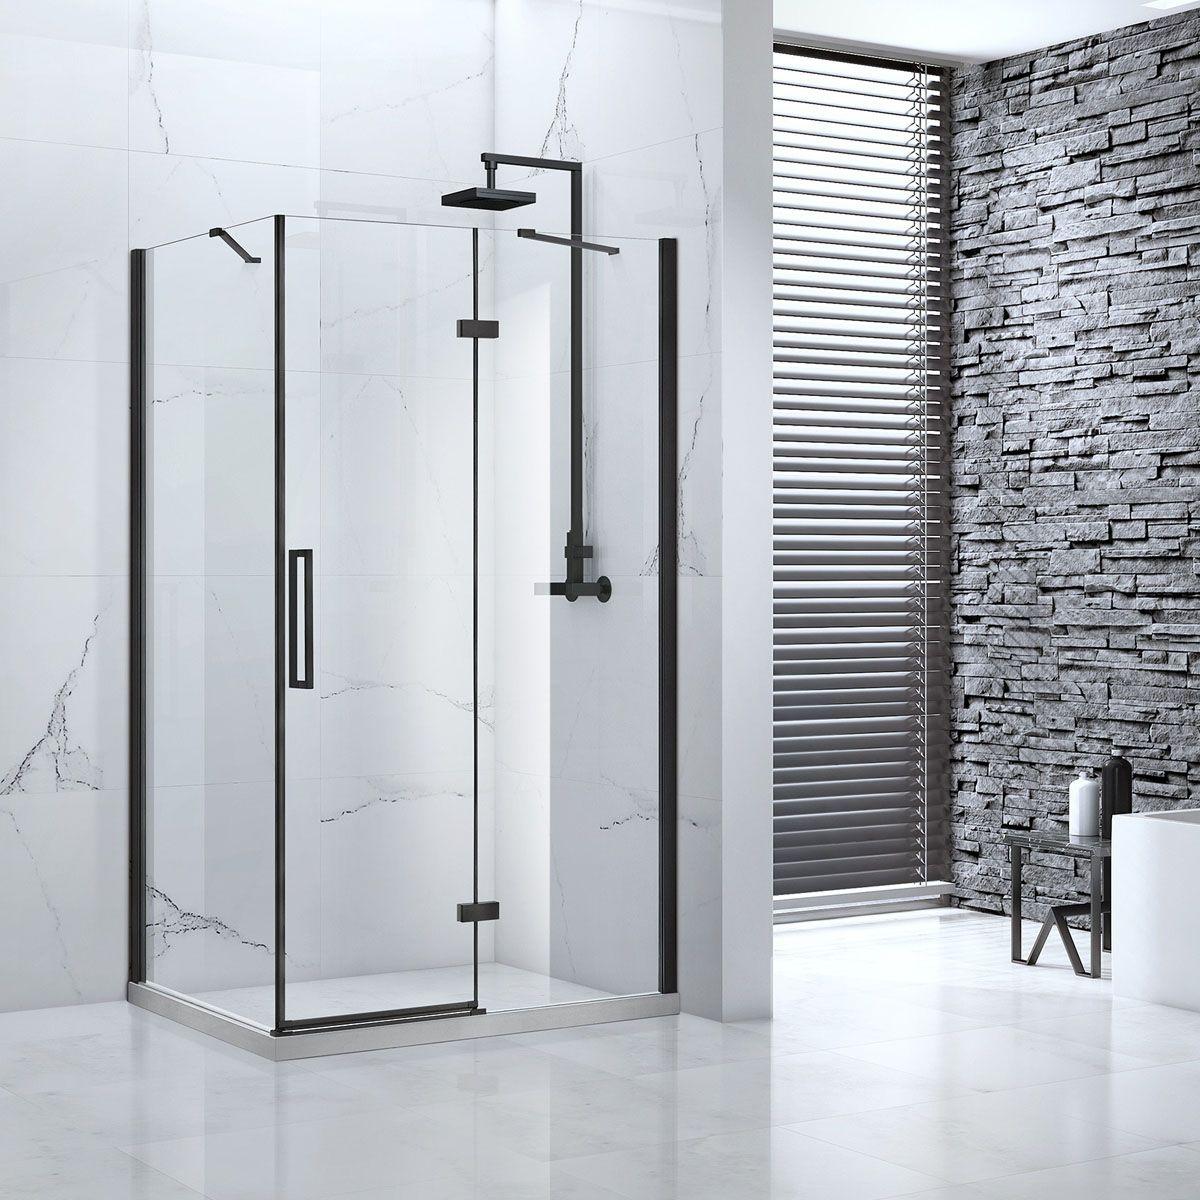 Frontline Aquaglass Onyx Black Hinged Shower Enclosure